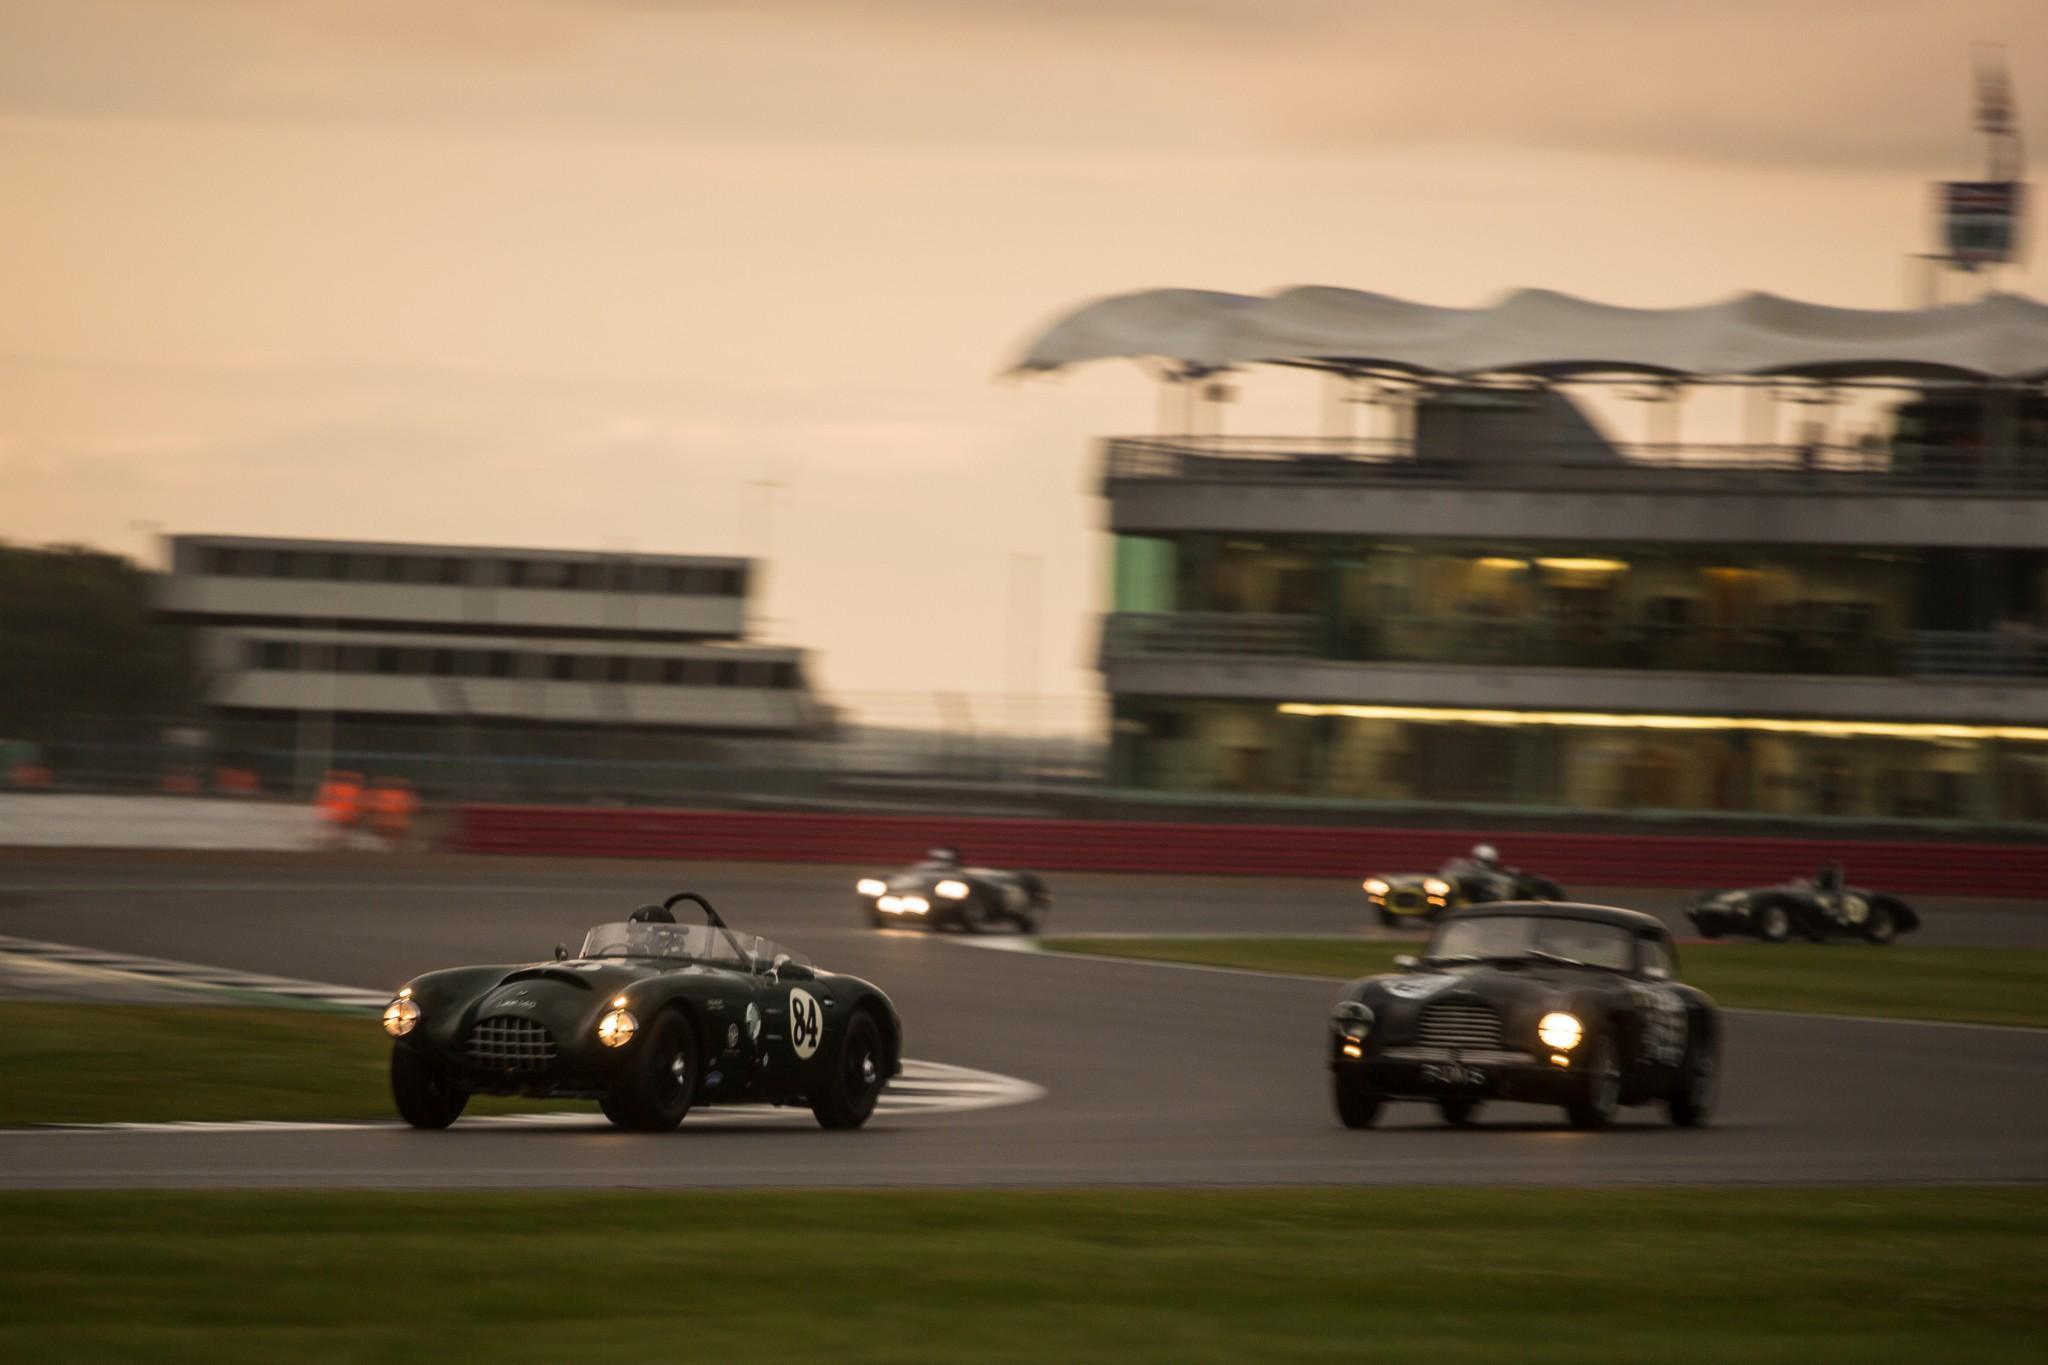 Post War Sportscars racing into the night on Saturday